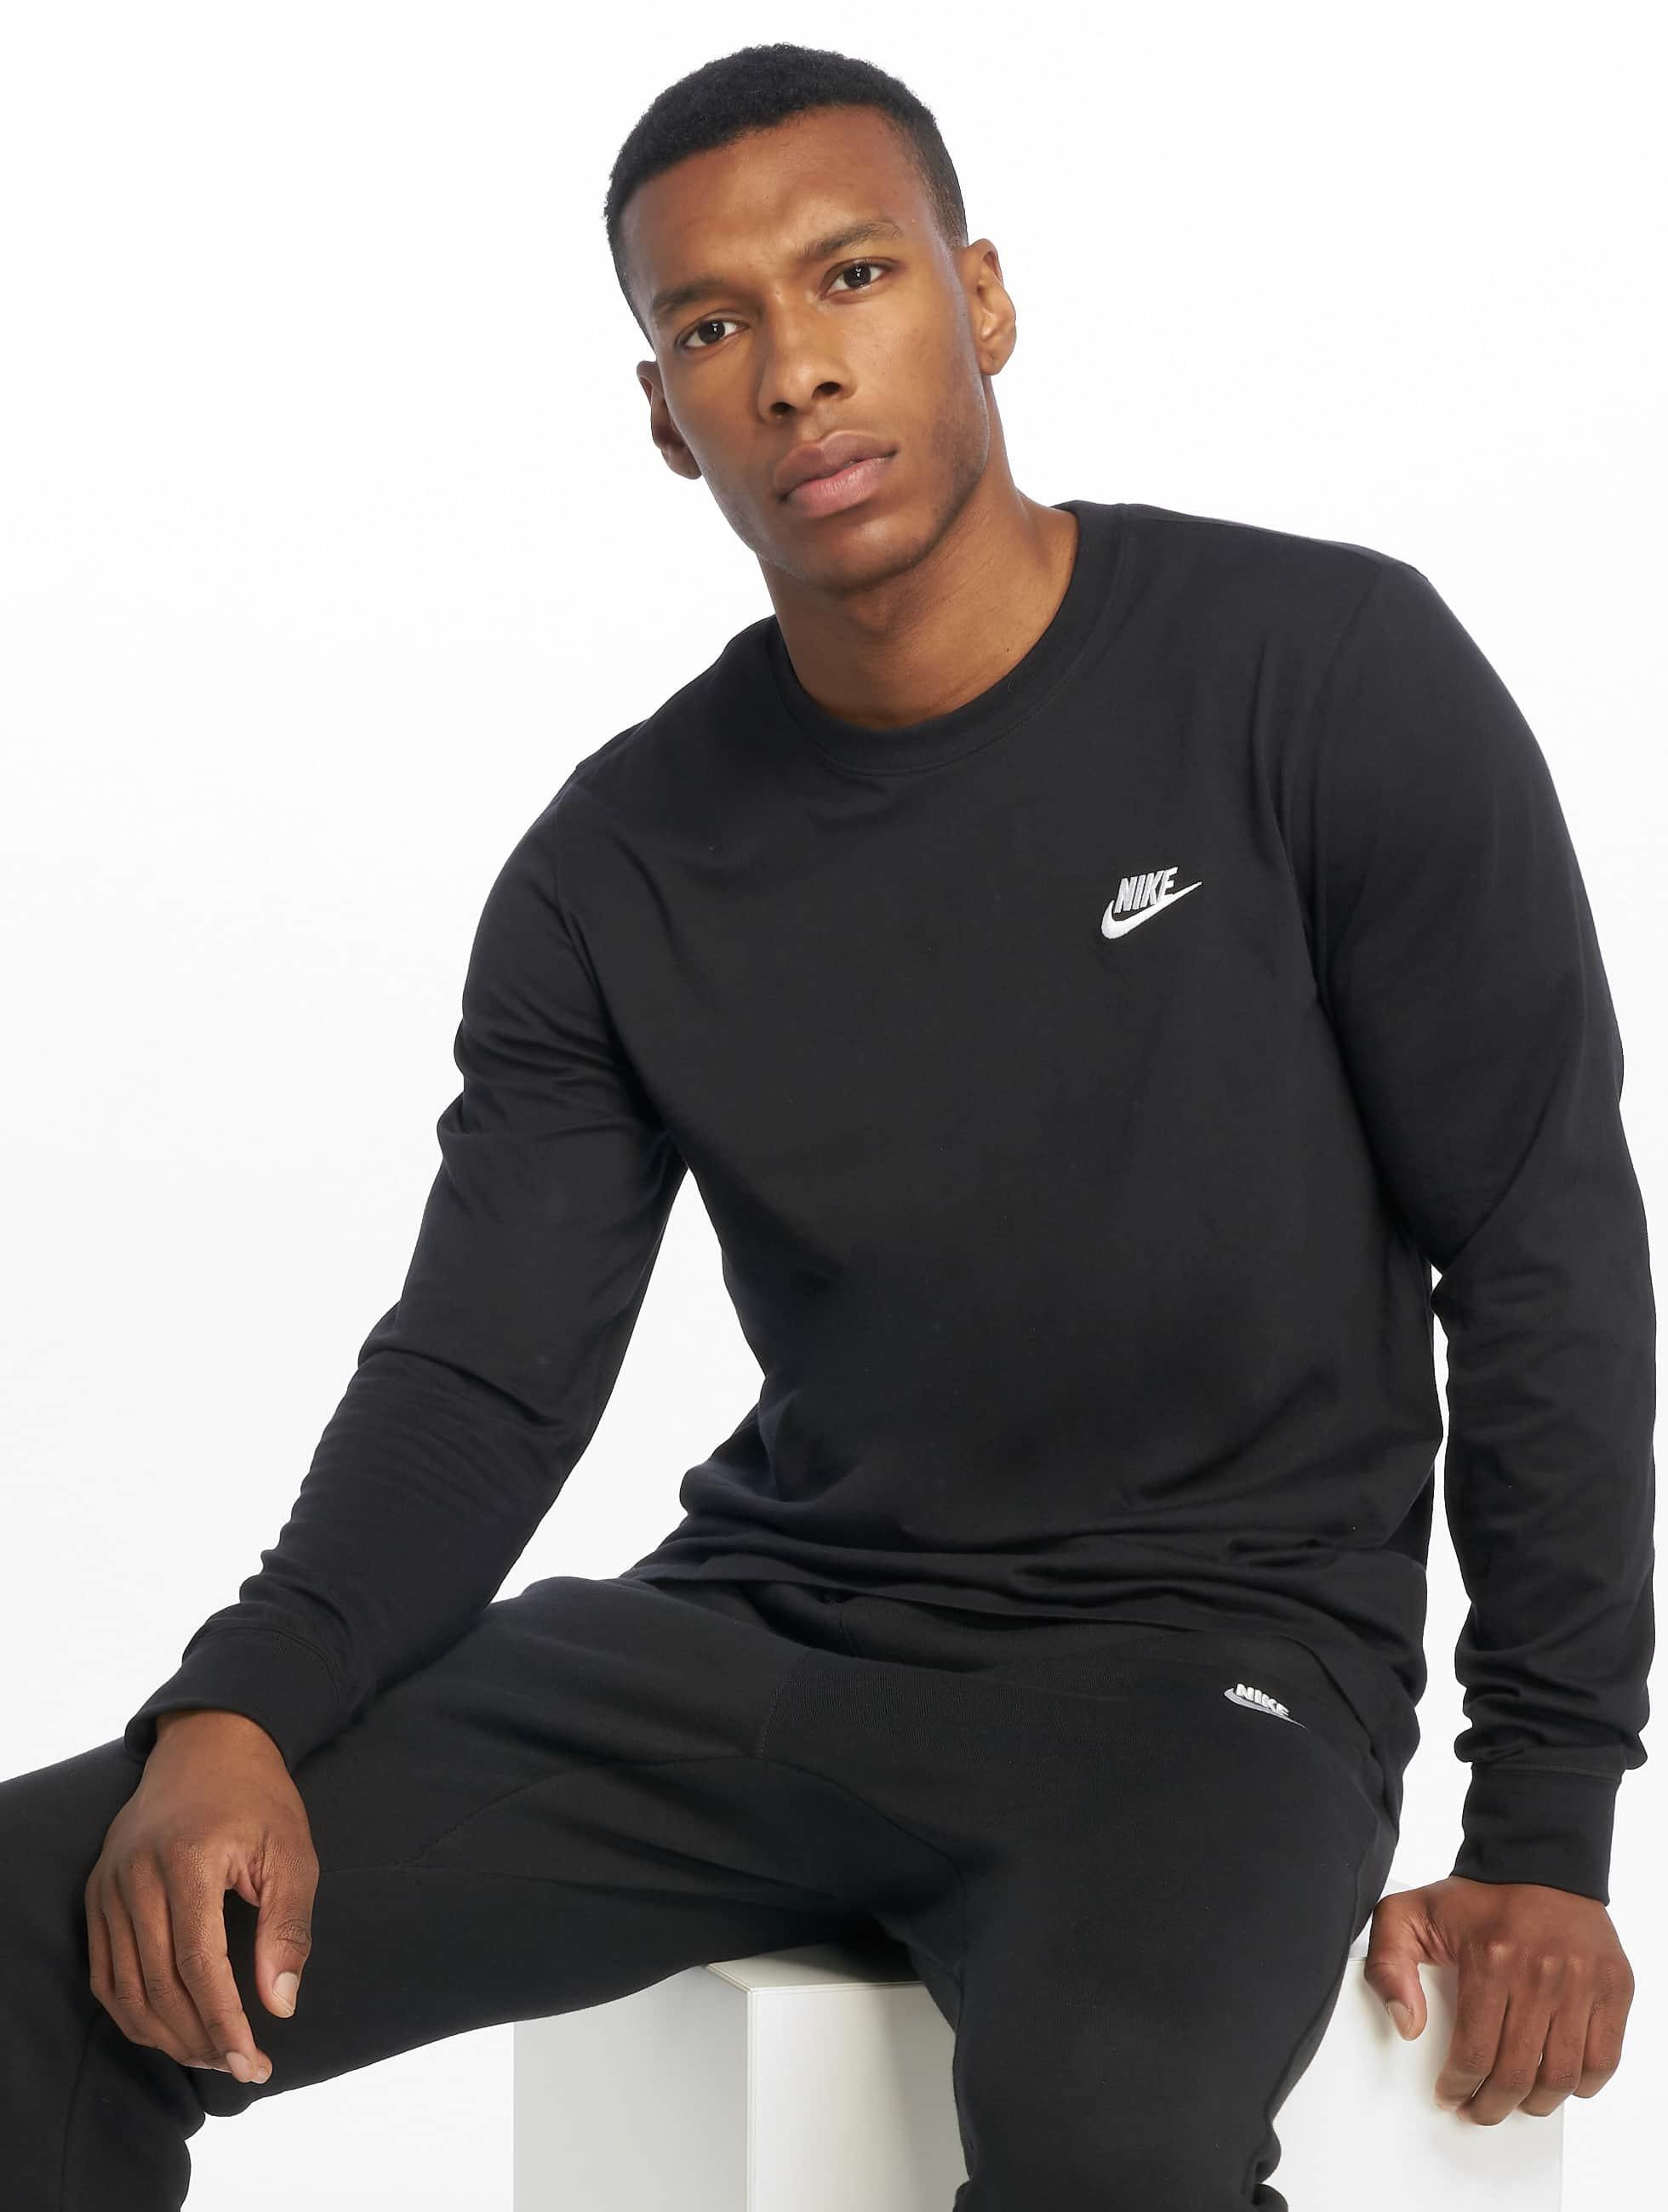 Boys XS TP 3 4 Years Nike Air Jordan Jacket